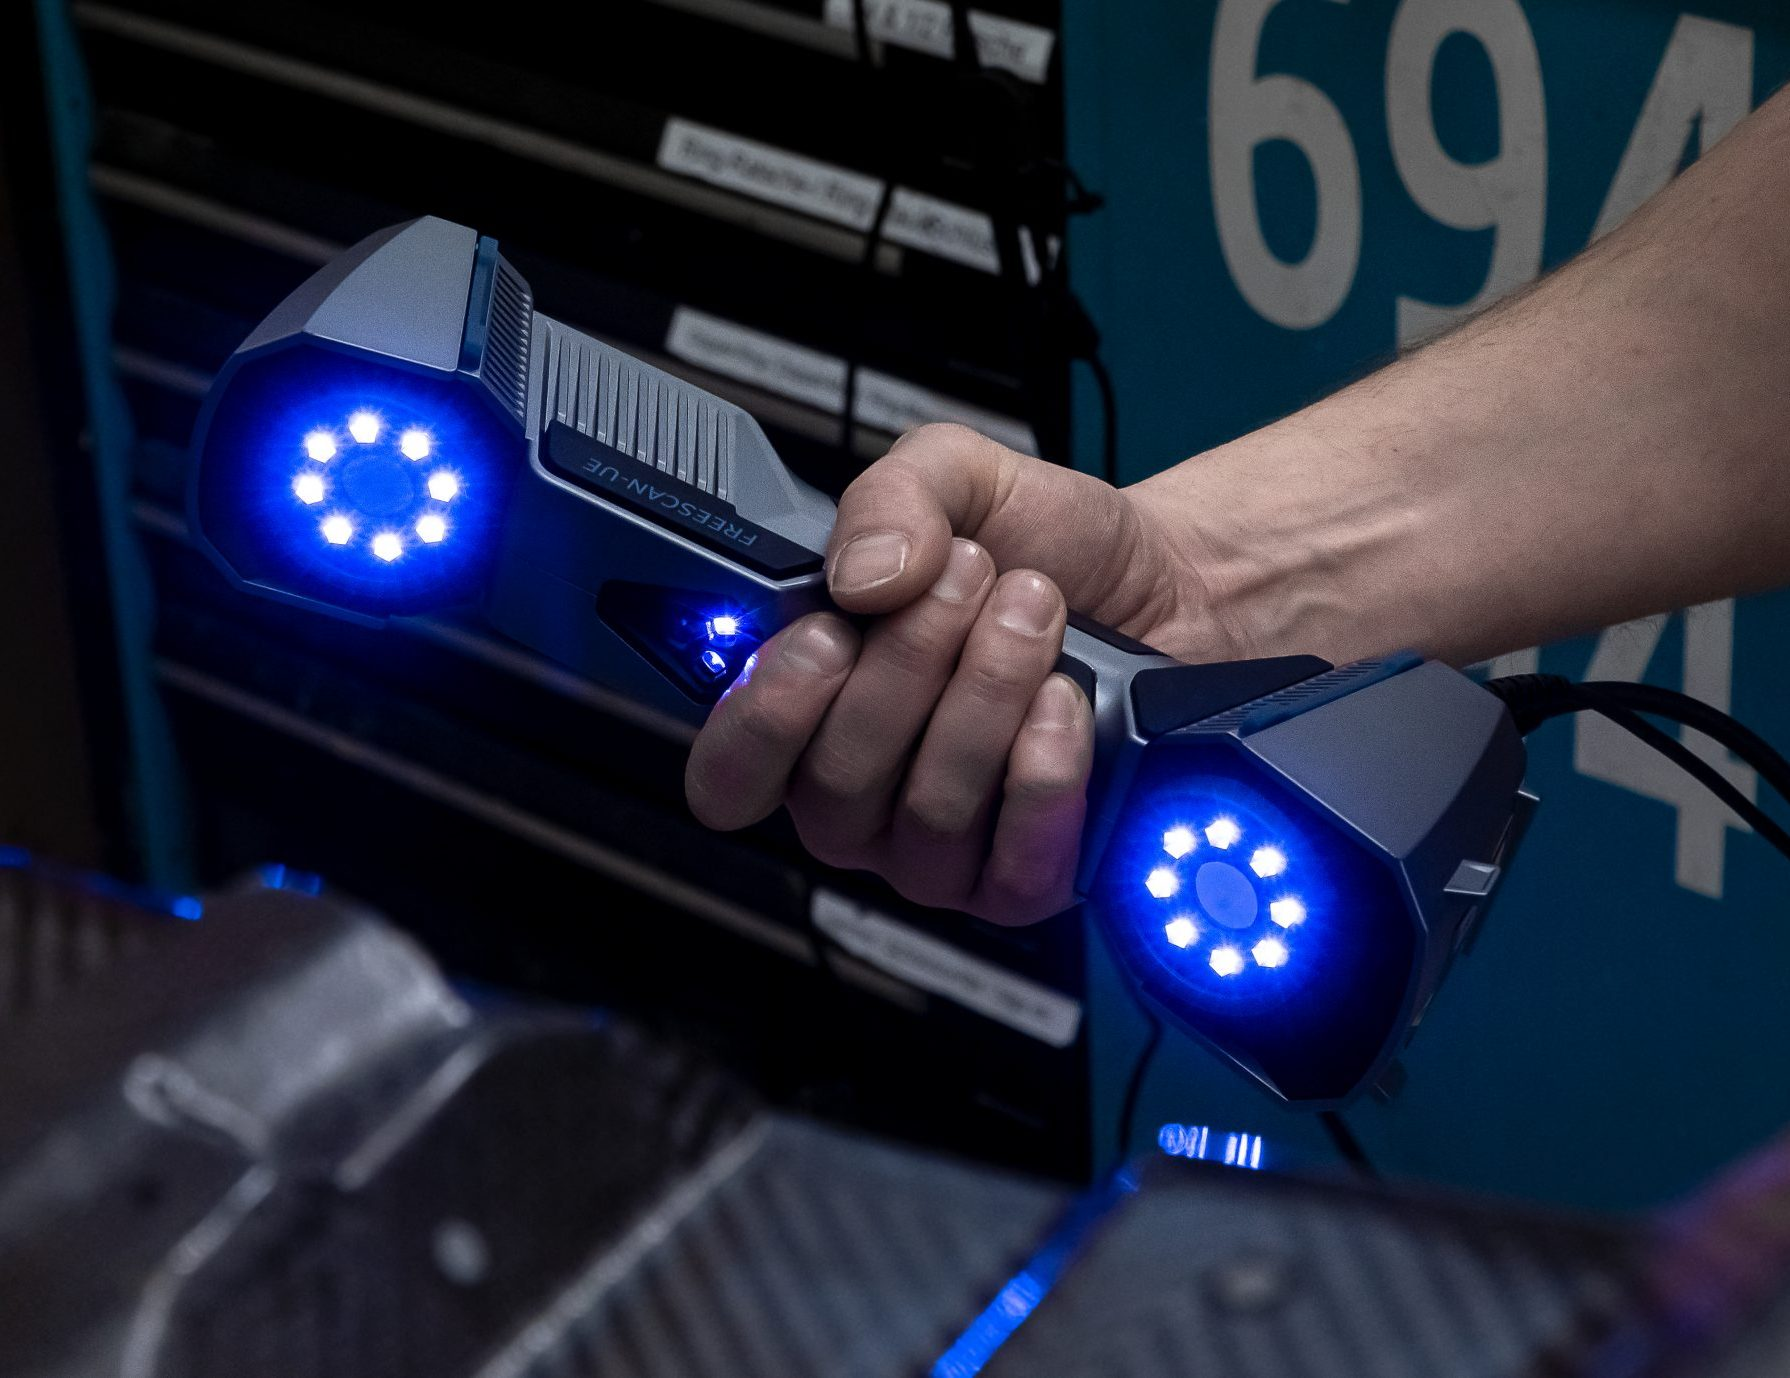 Next-gen Shining 3D FreeScan series: meet the new UE7 and UE11 handheld laser 3D scanners for metrology